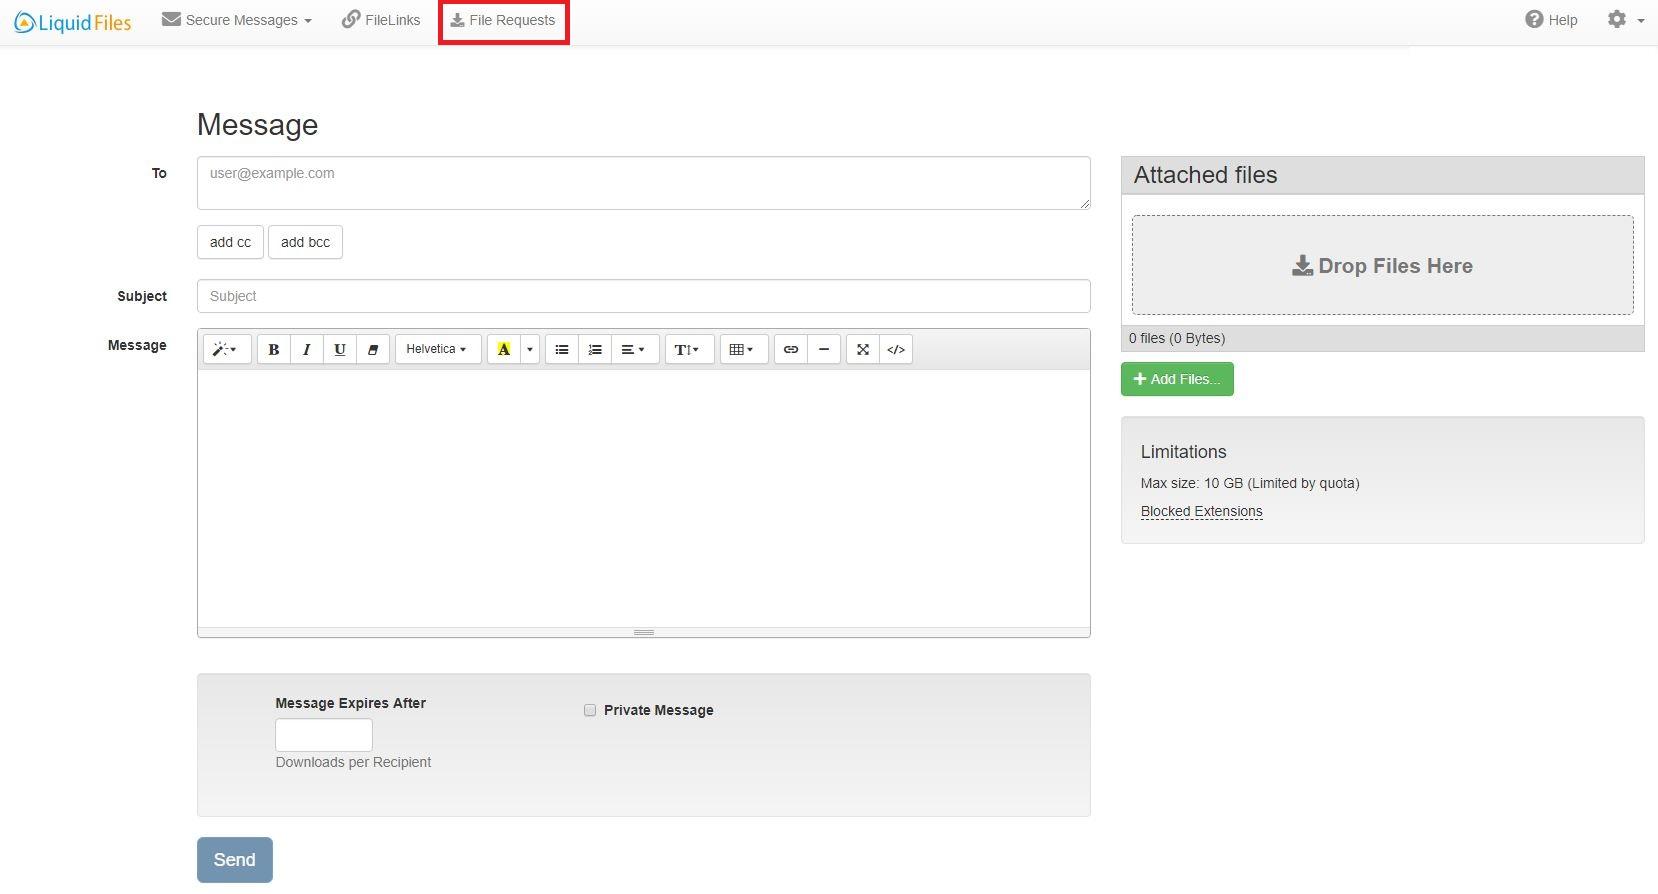 Select File Request